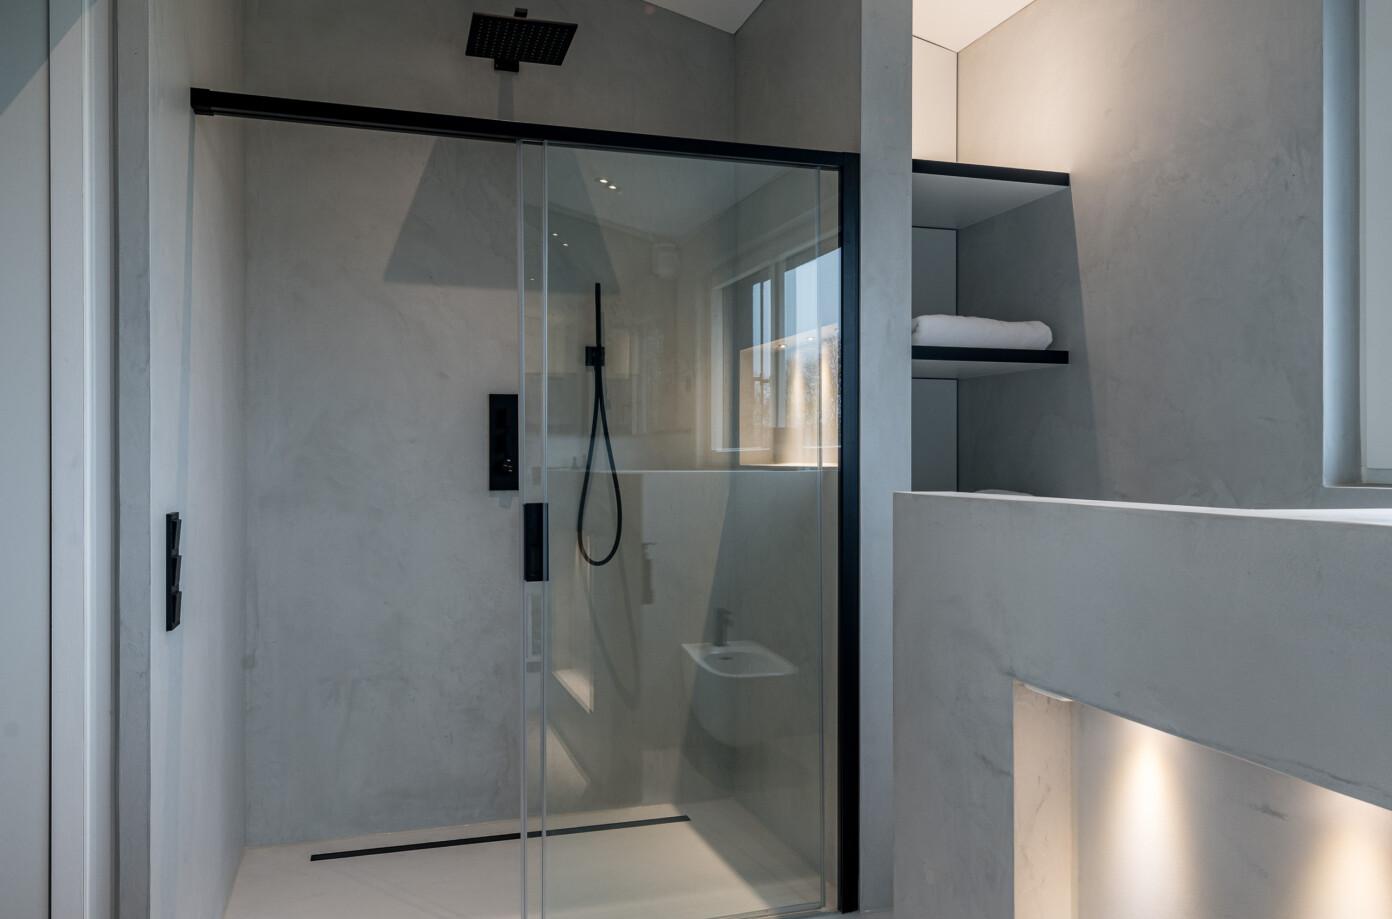 Wb design bodenbeschichtungnassbereich bathinglounge 002